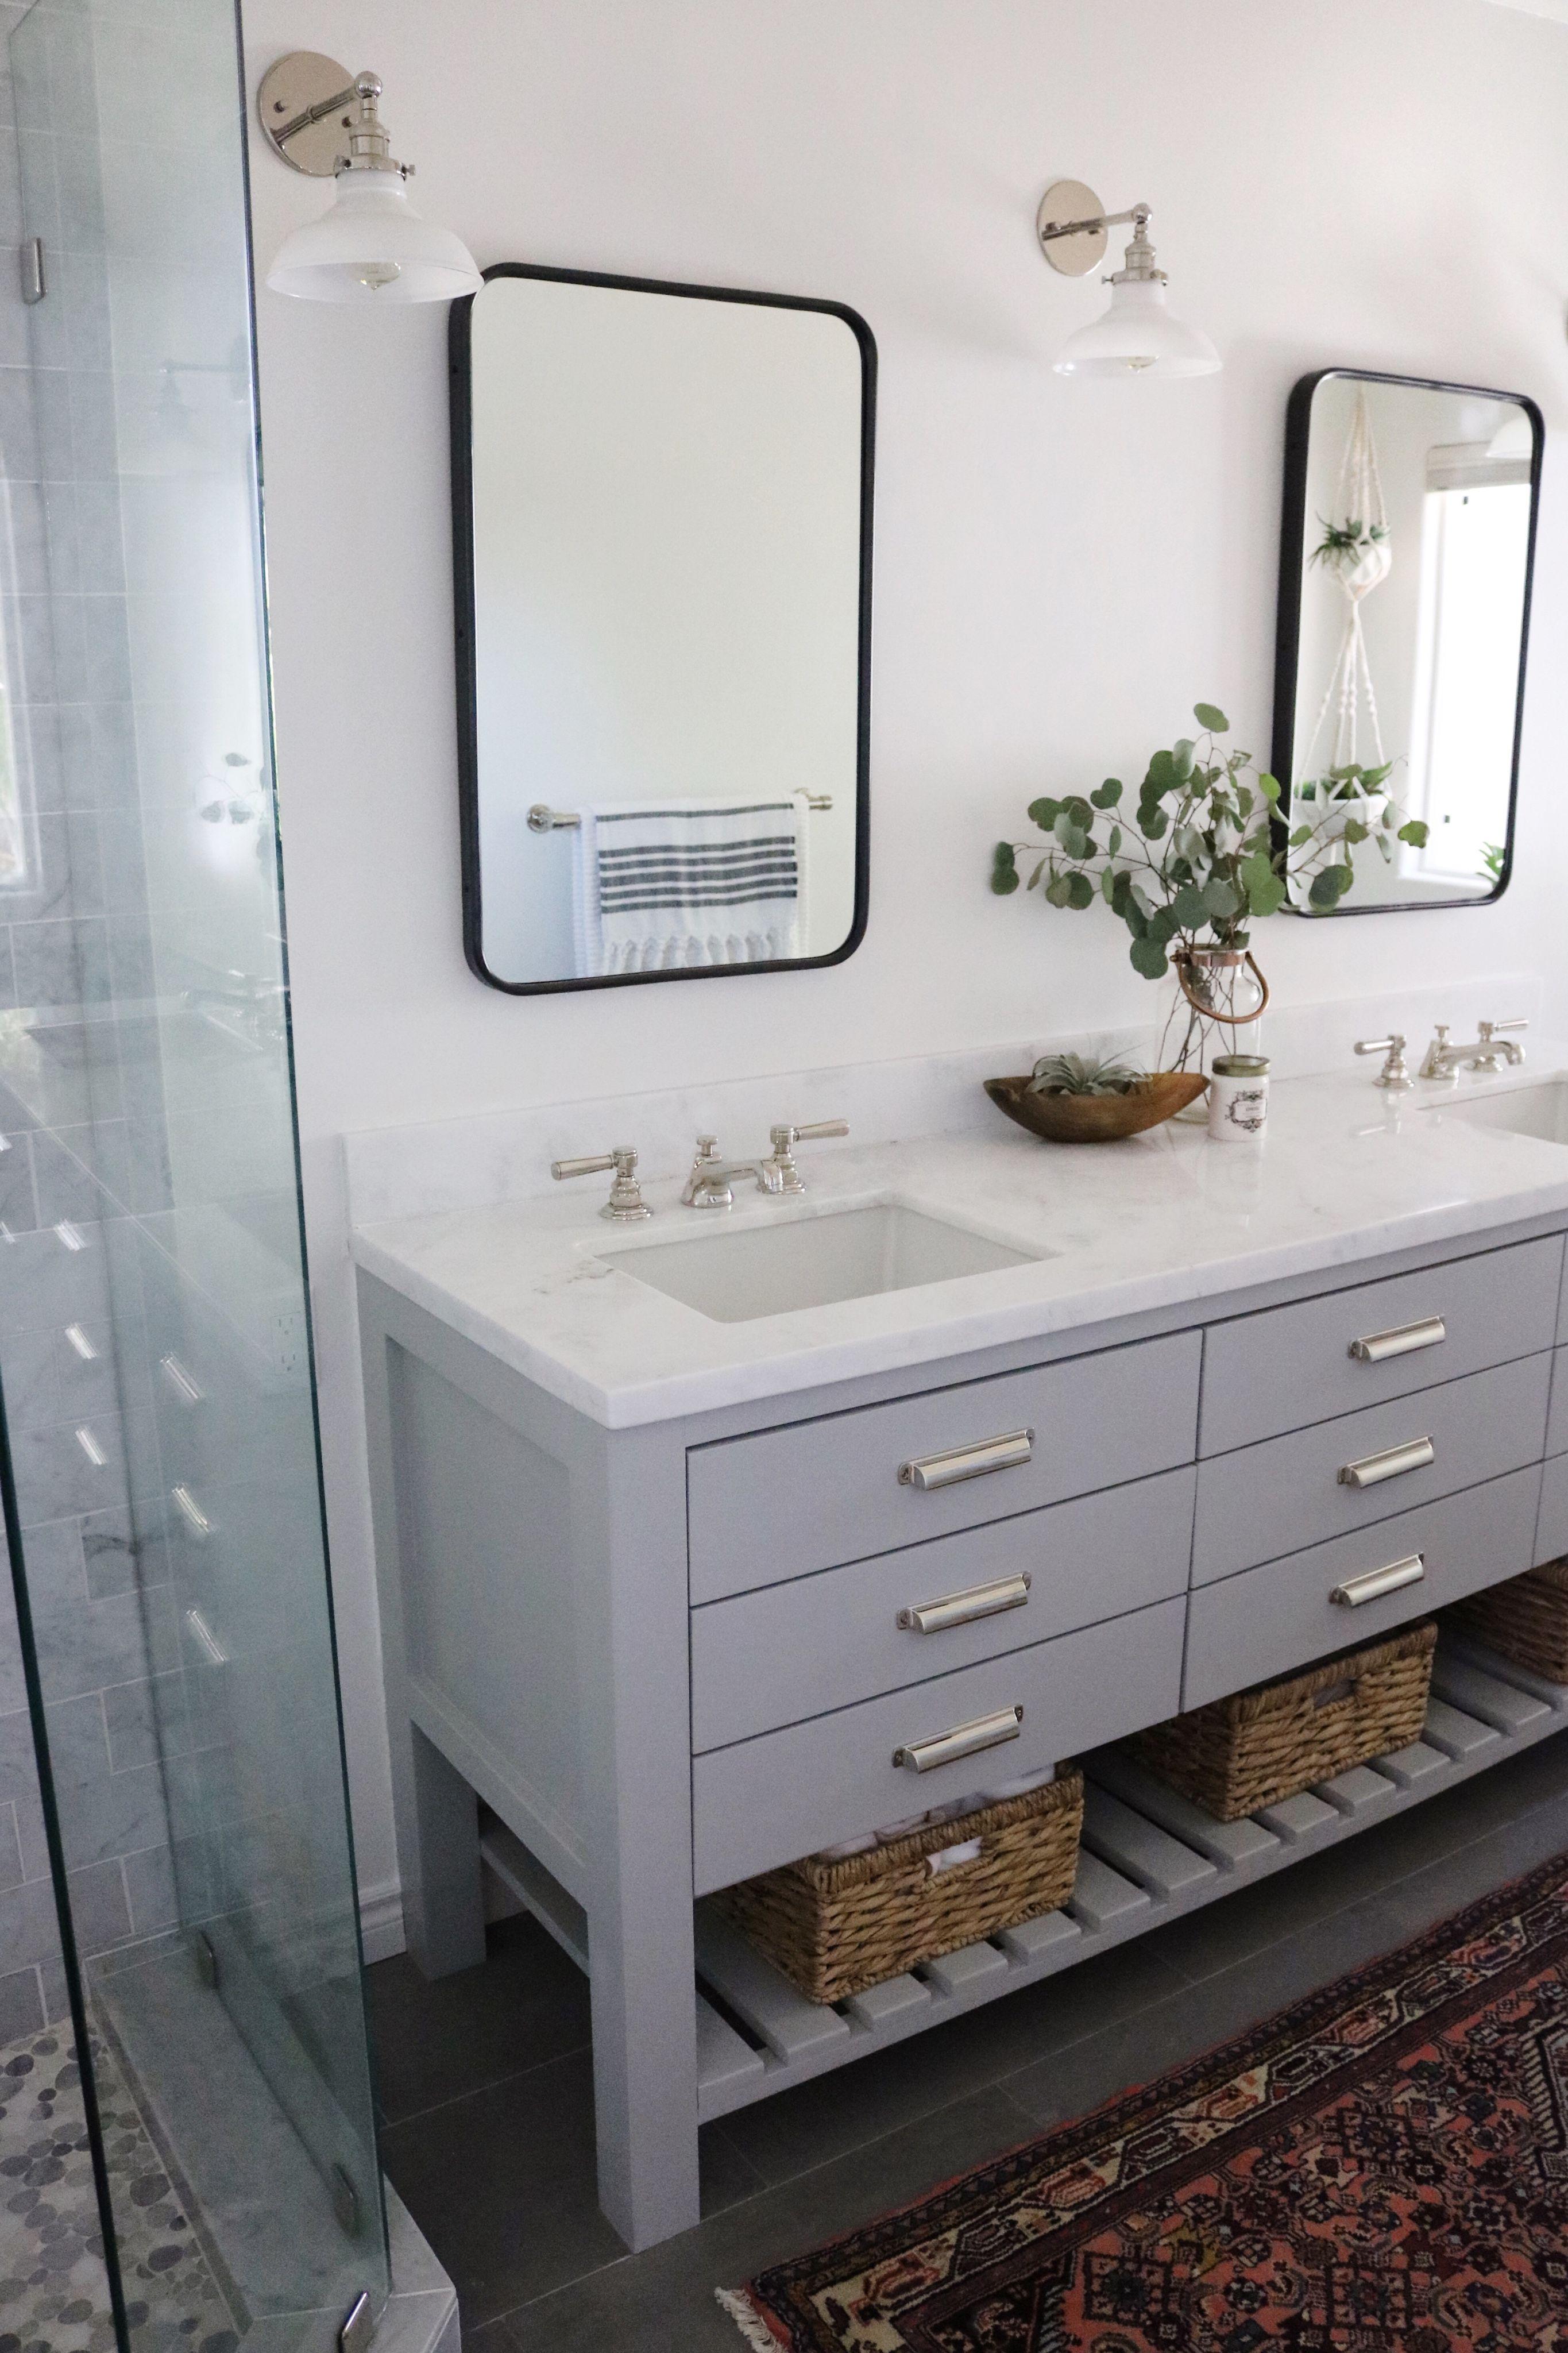 San Diego Interior Designer Sdvoyager  San Diego  Bathrooms Classy San Diego Bathroom Remodel Inspiration Design